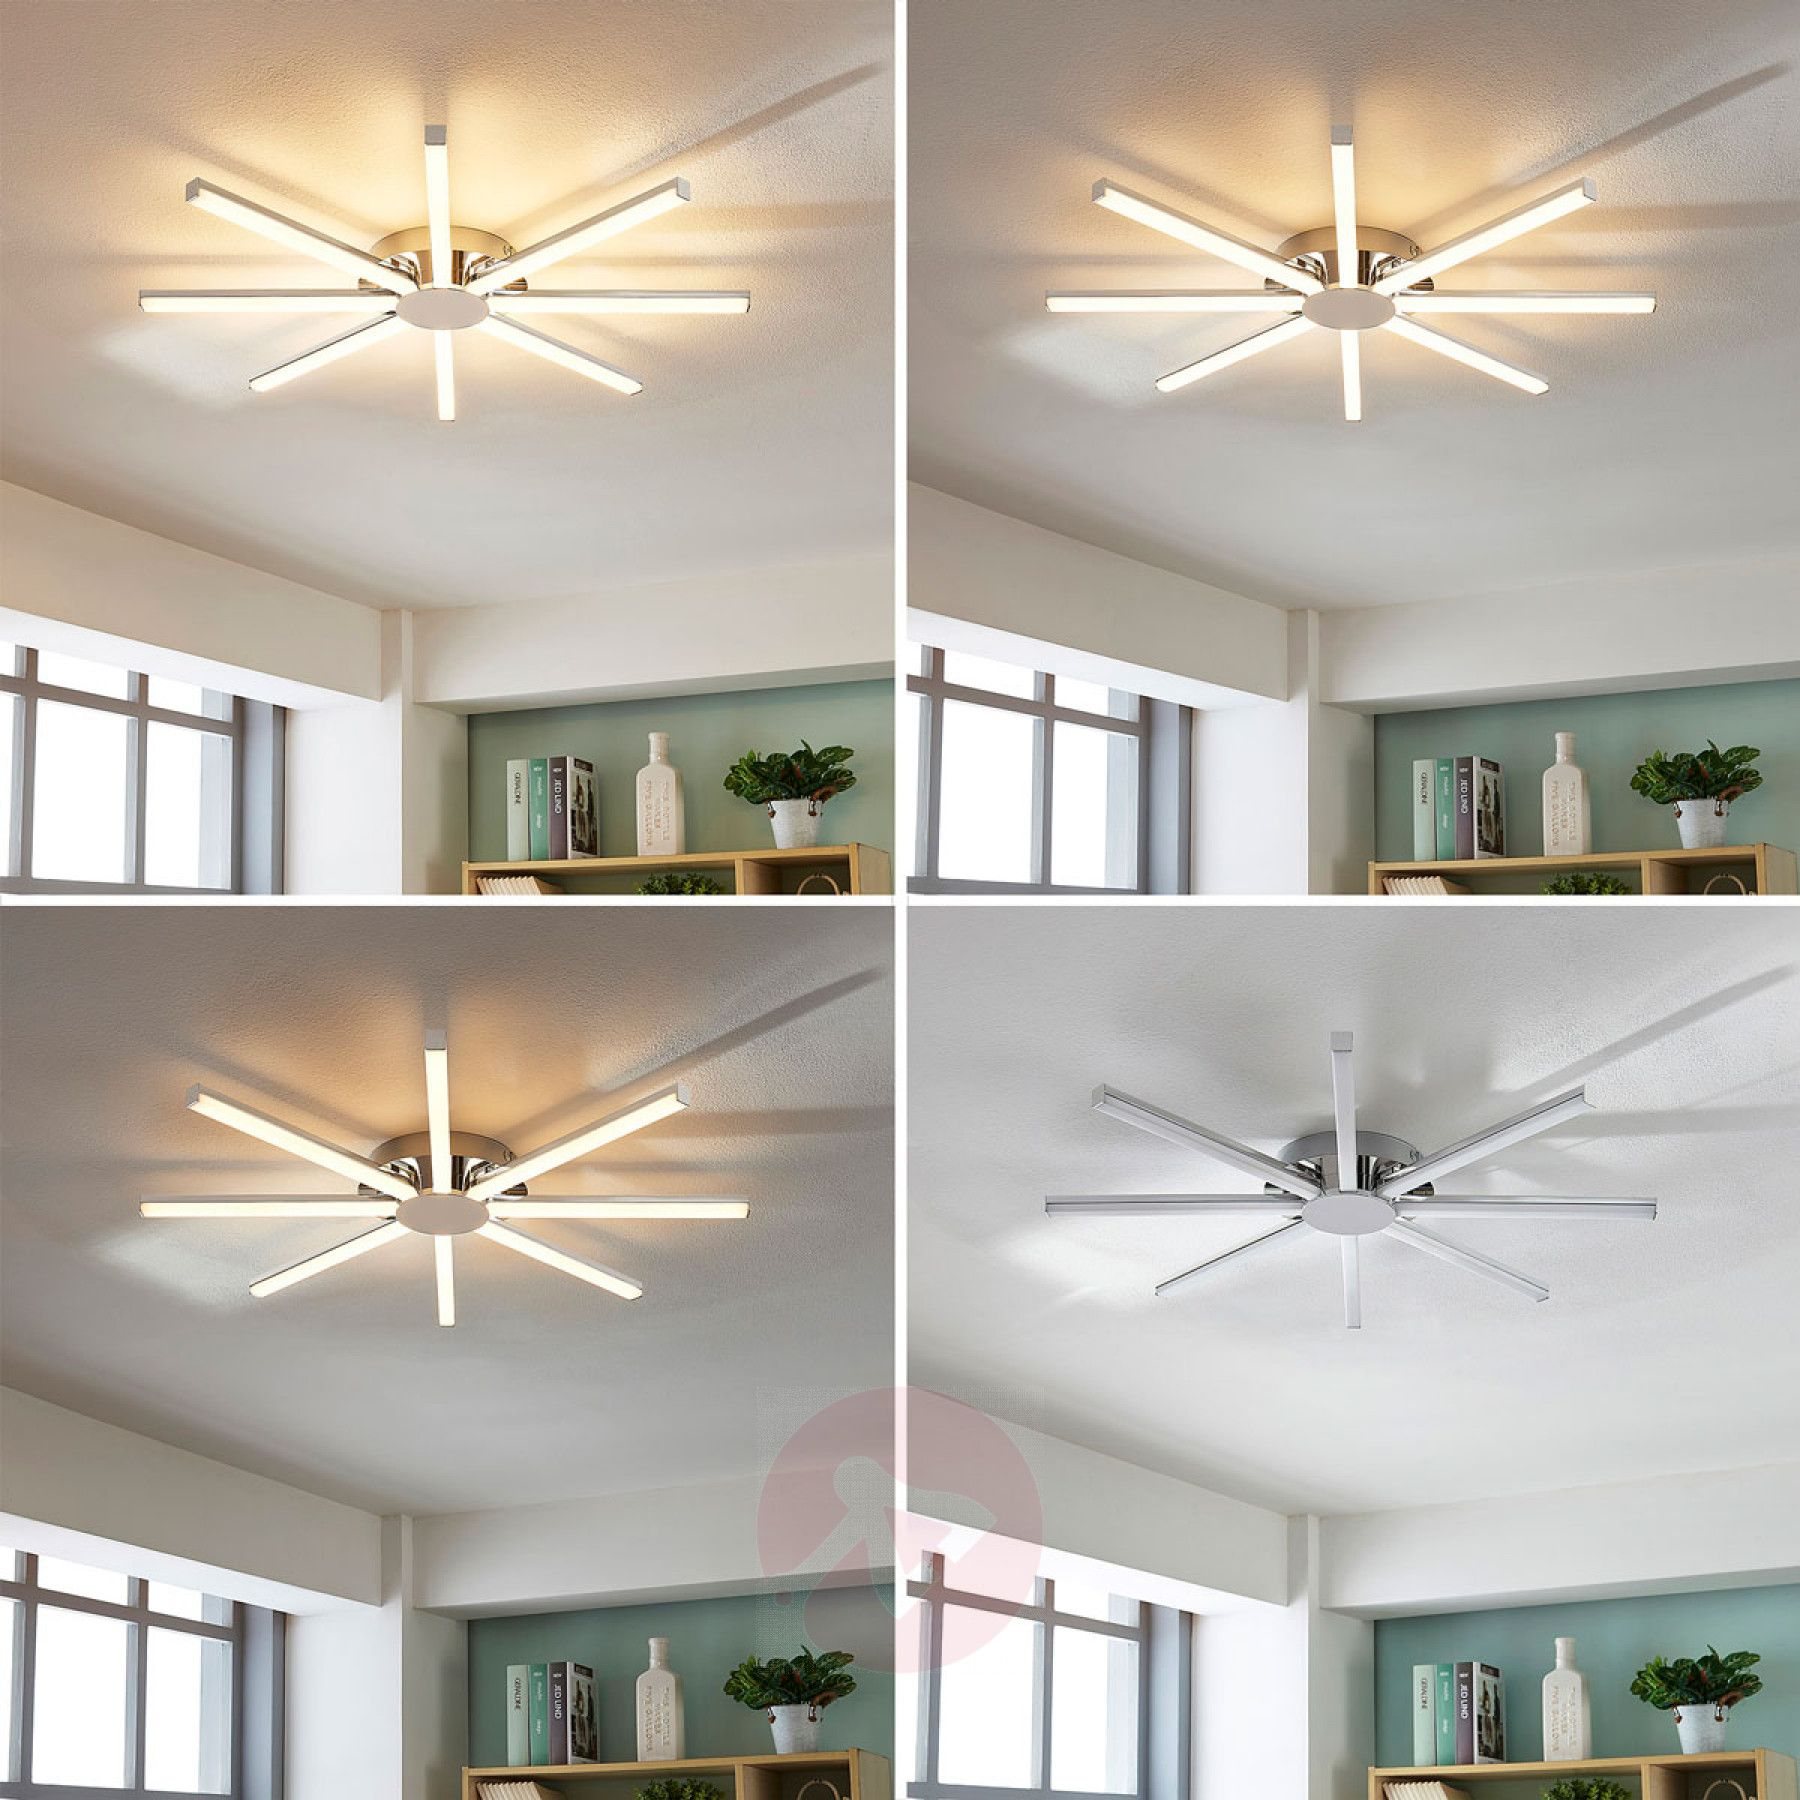 Korona Sun Shaped Led Ceiling Lamp Dimmable 9621610 03 Ceiling Lamp Led Ceiling Lamp Led Ceiling